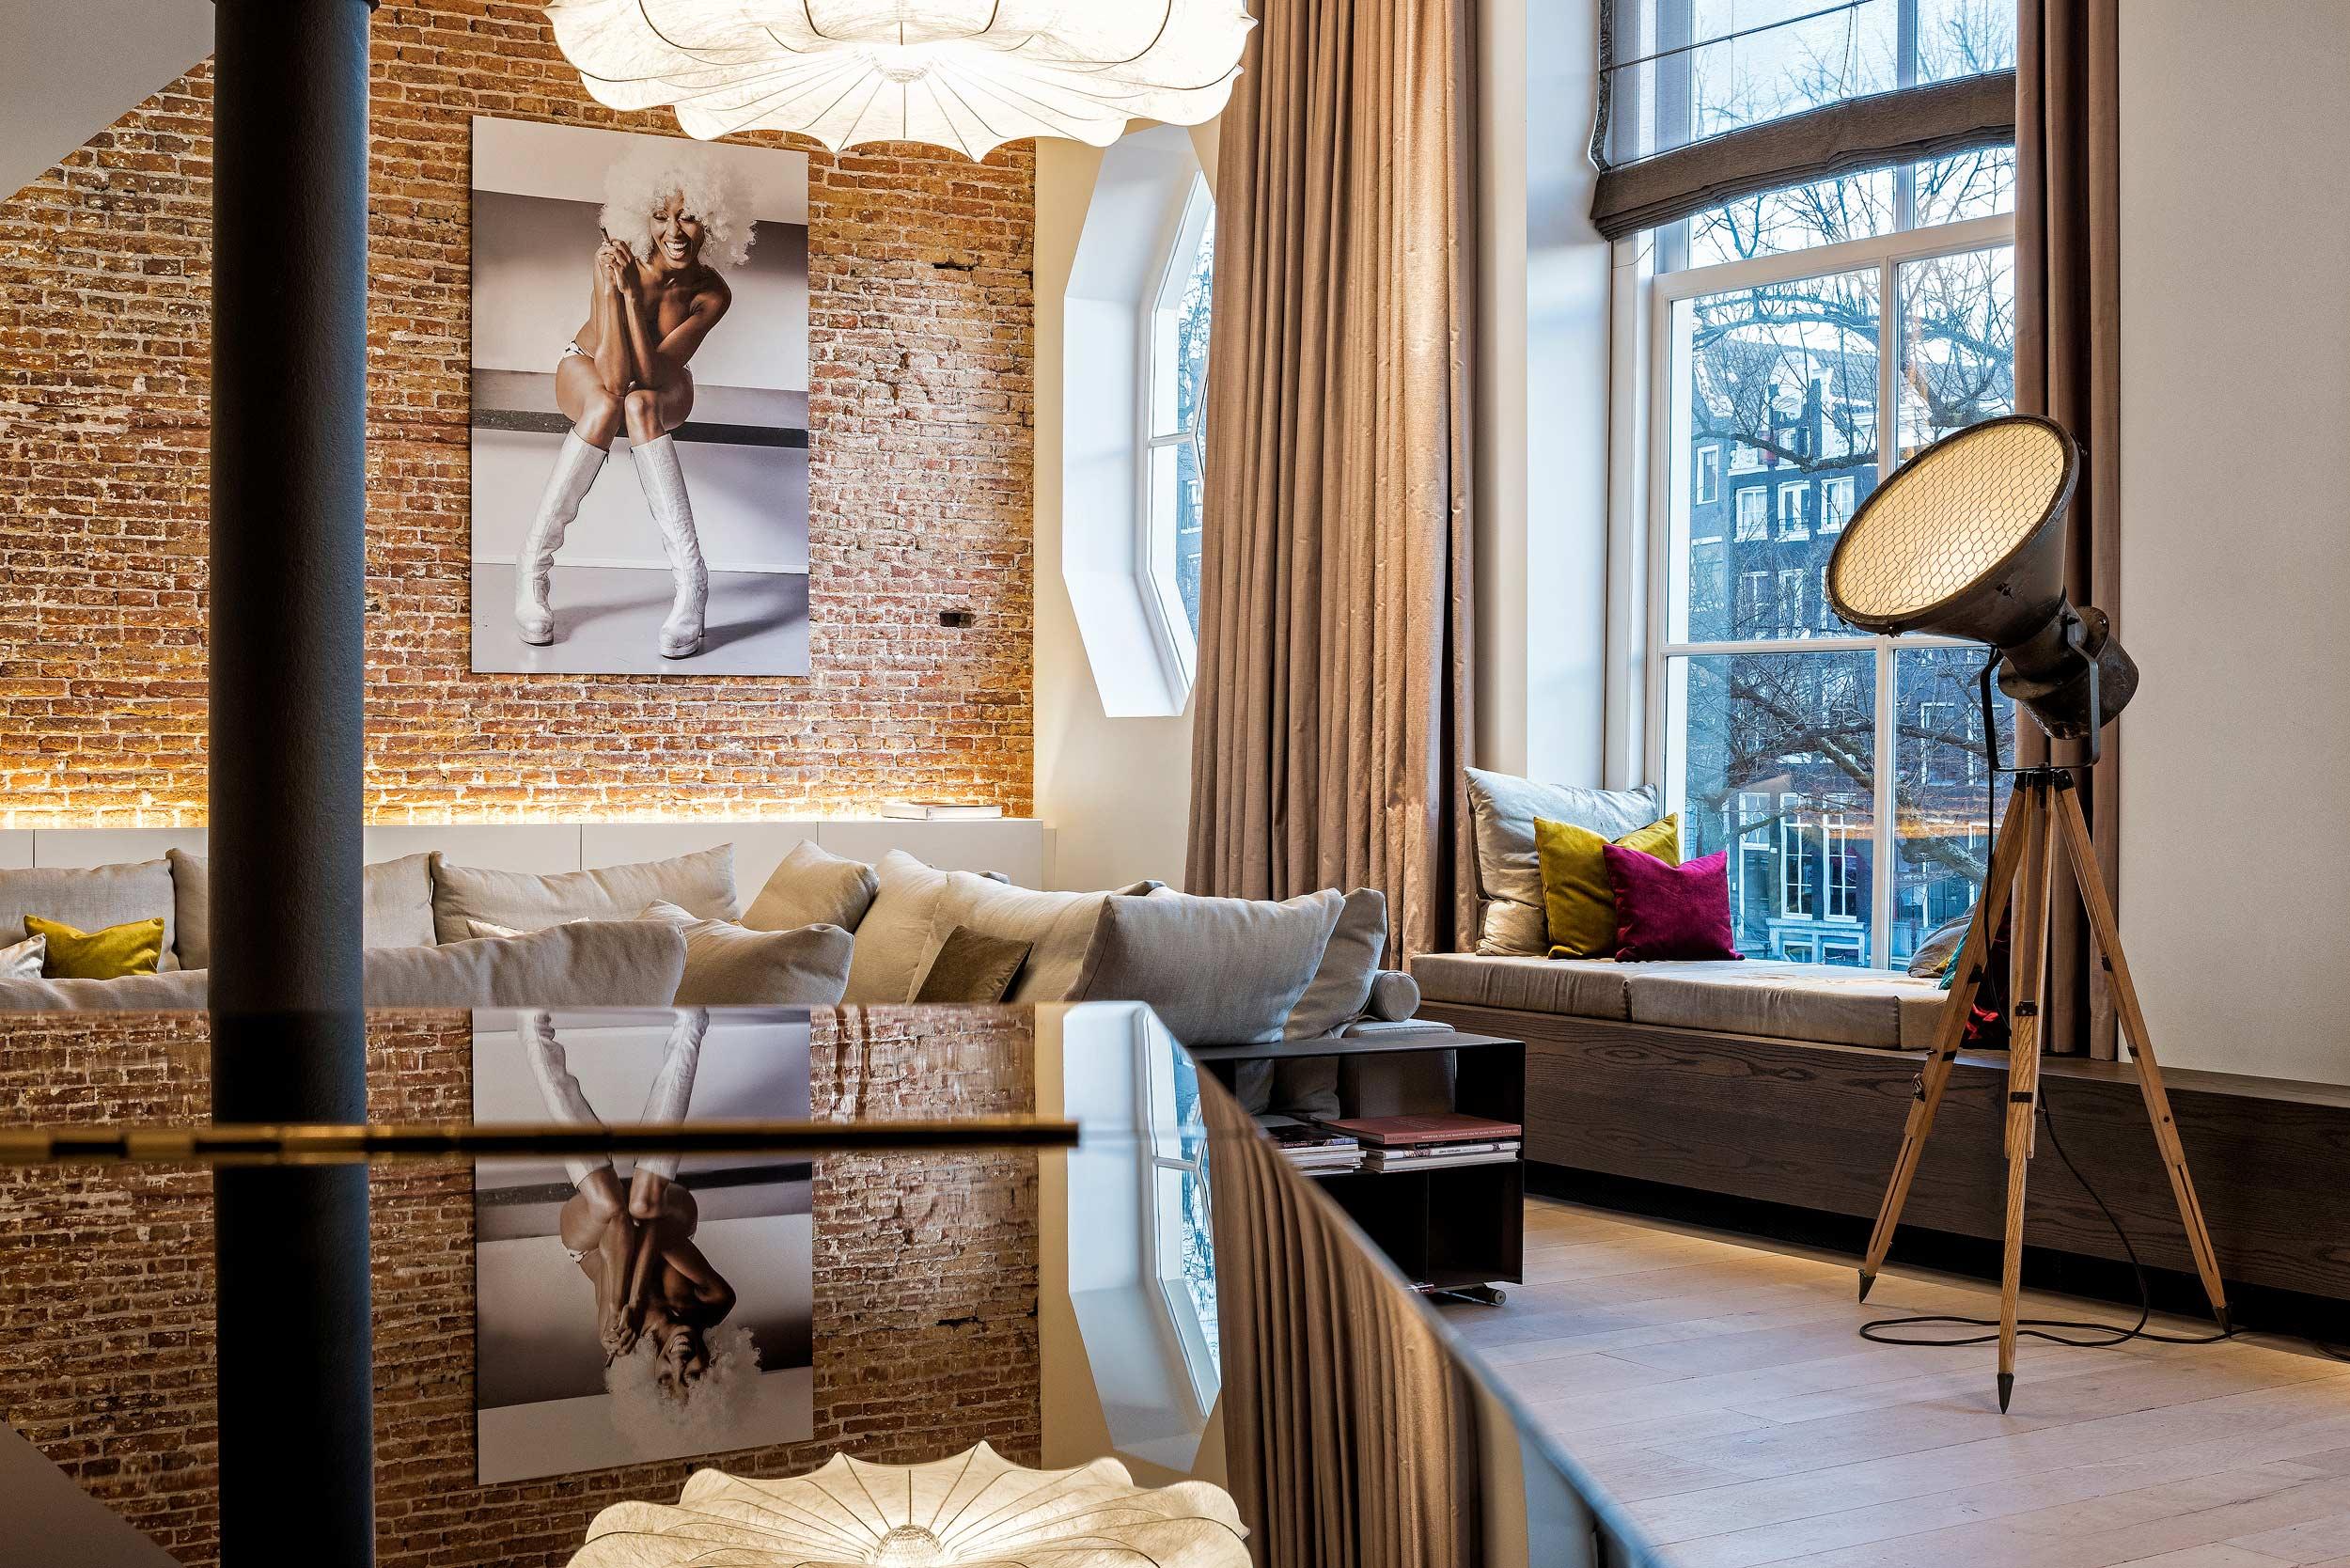 Interieurfotograaf Amsterdam - Chiel de Nooyer, Interieurfotografie van grachtenpand